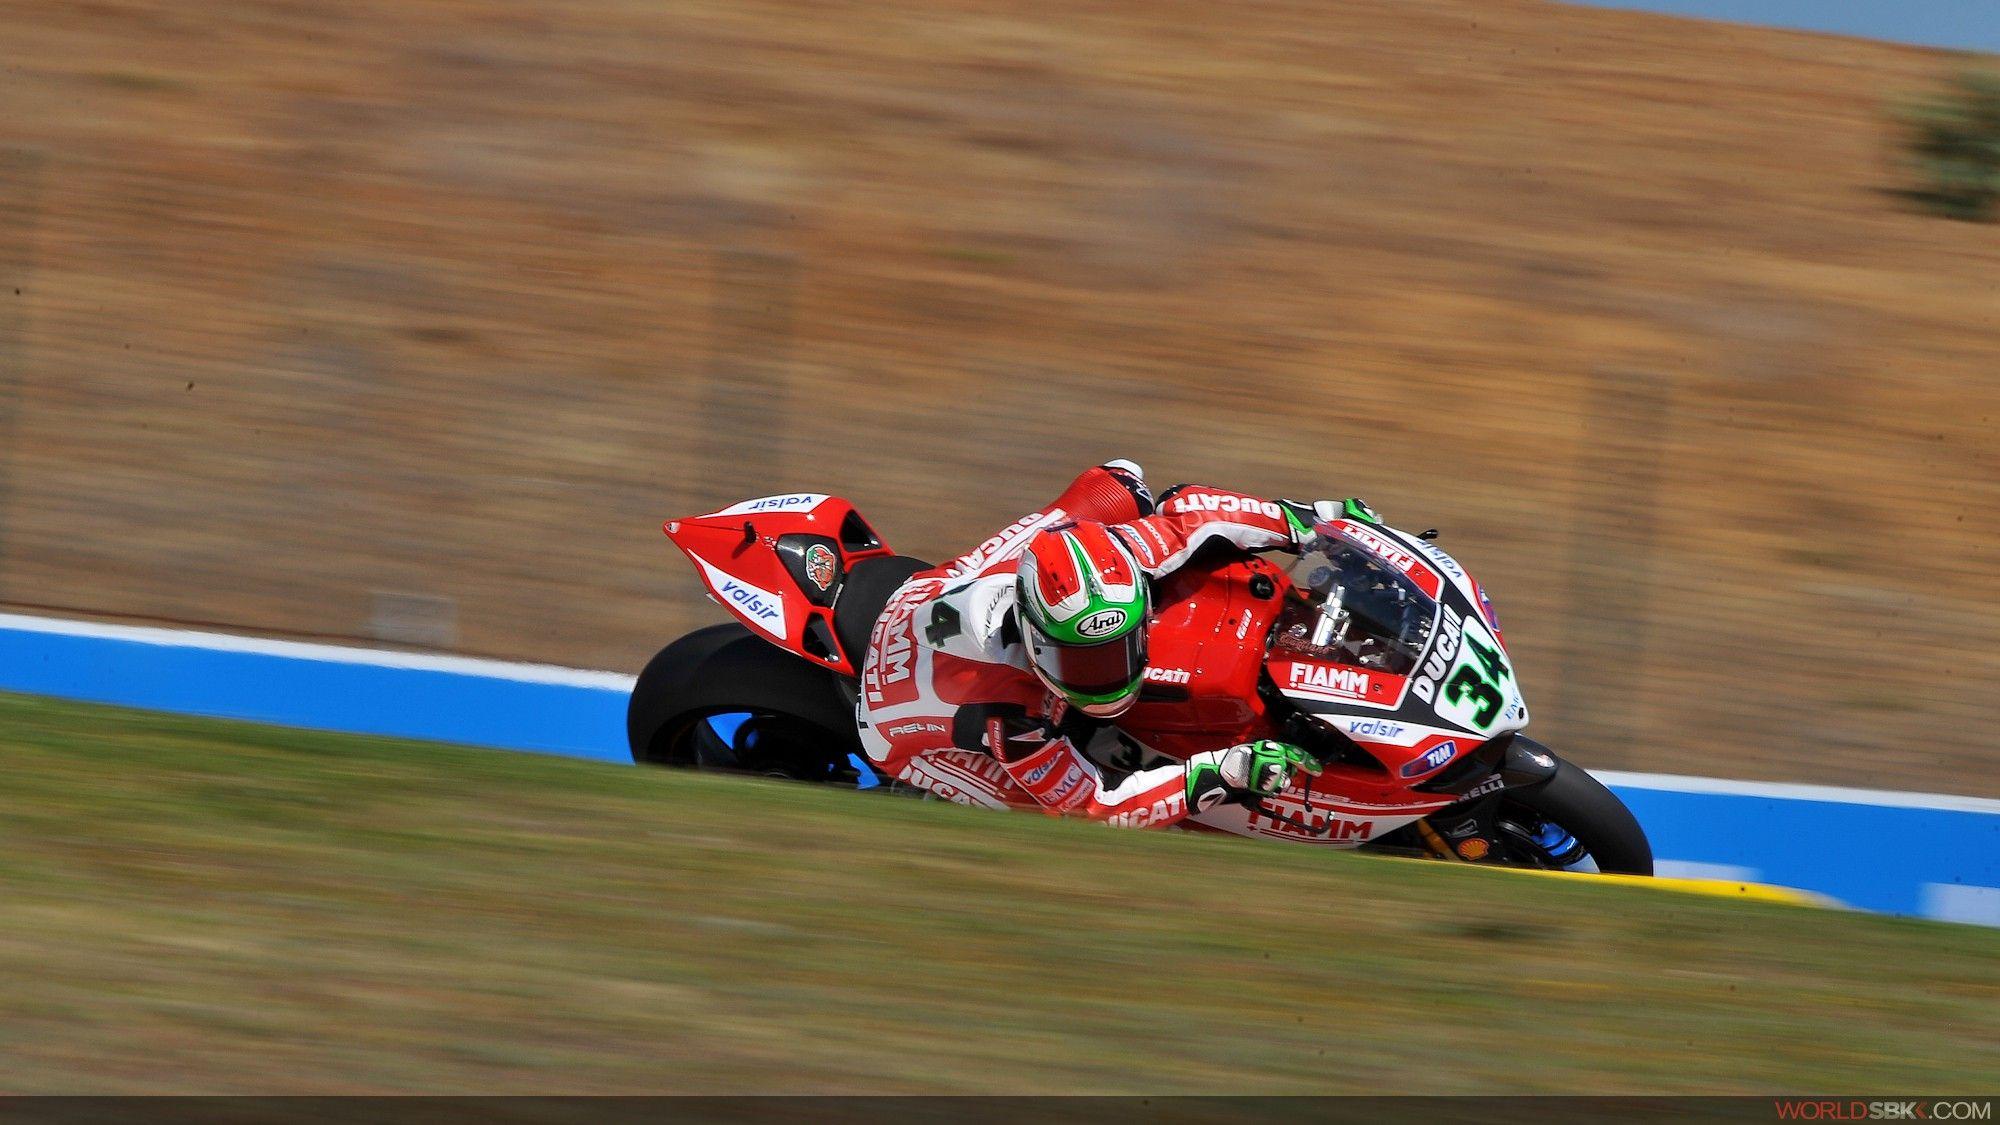 Davide Giugliano, Ducati Superbike Team, Portimao SP2